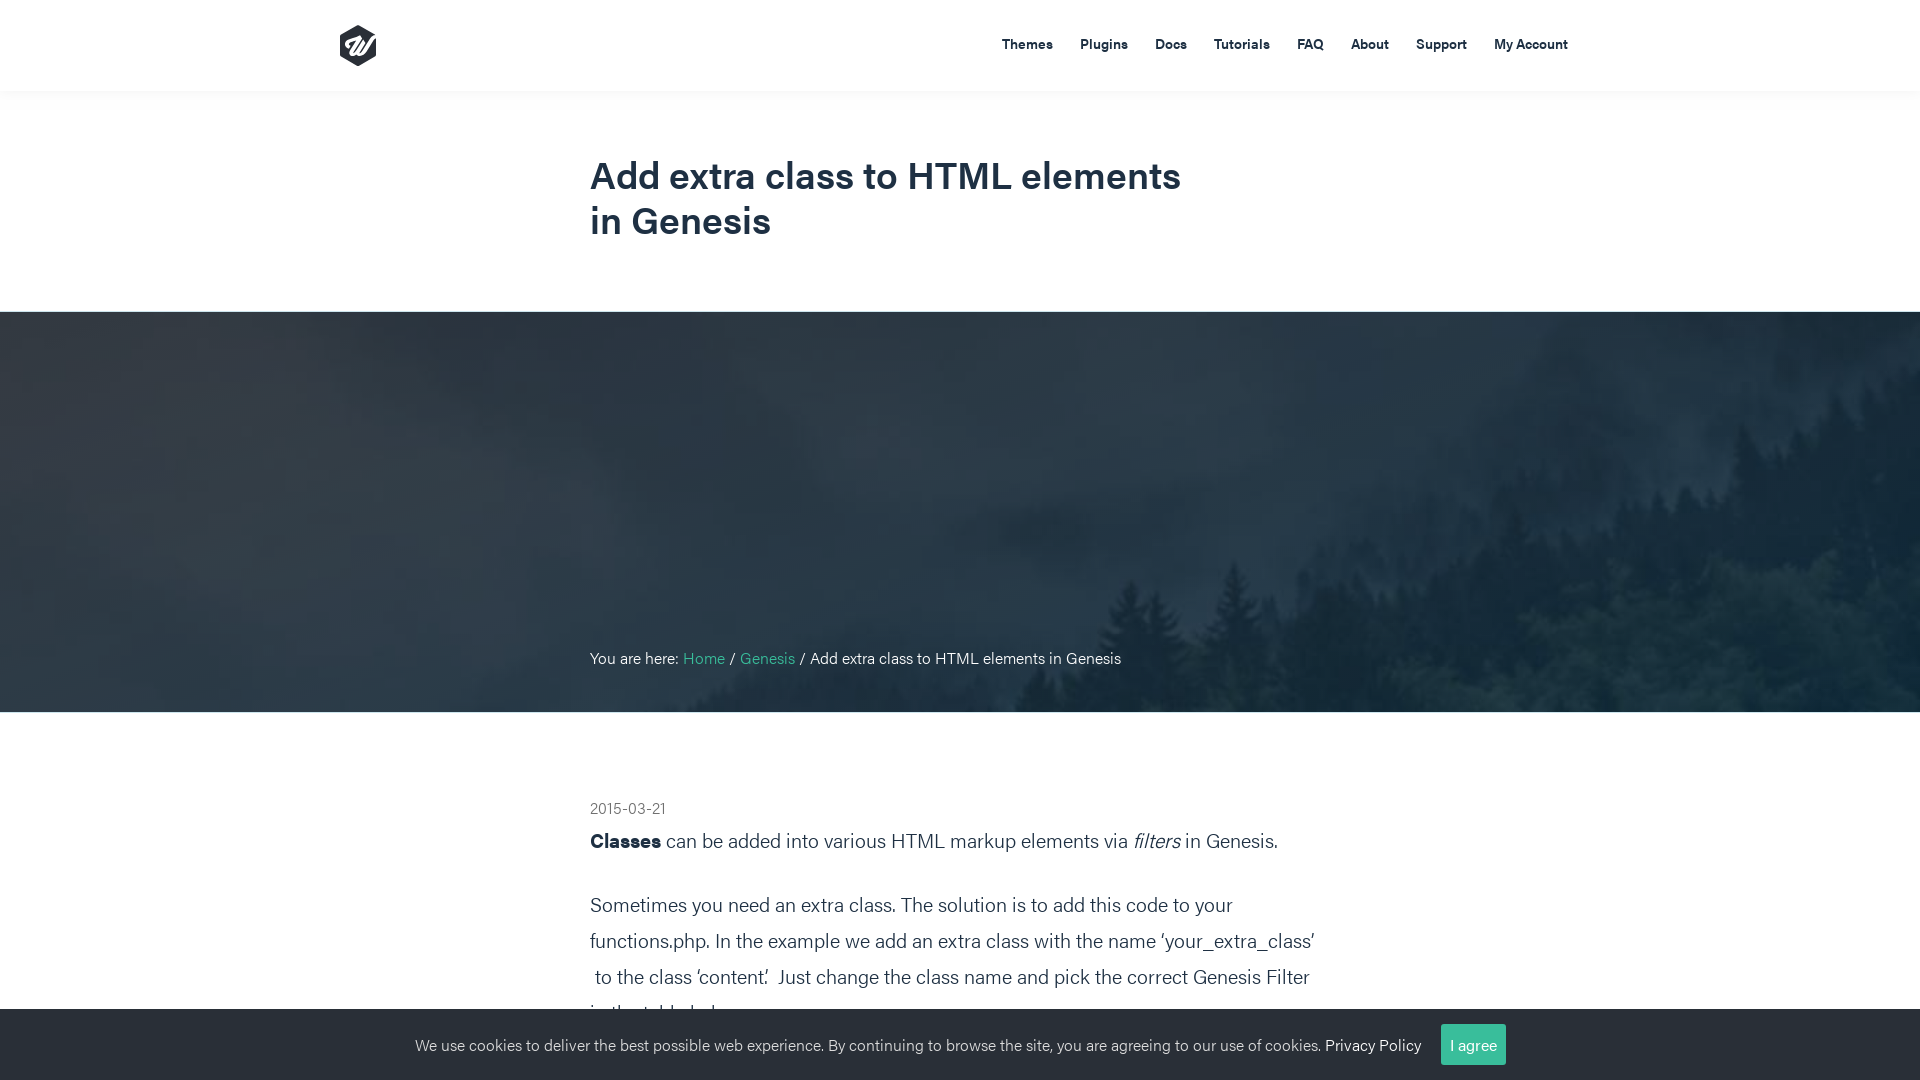 https://www.wpstud.io/add-extra-class-to-html-elements-in-genesis/